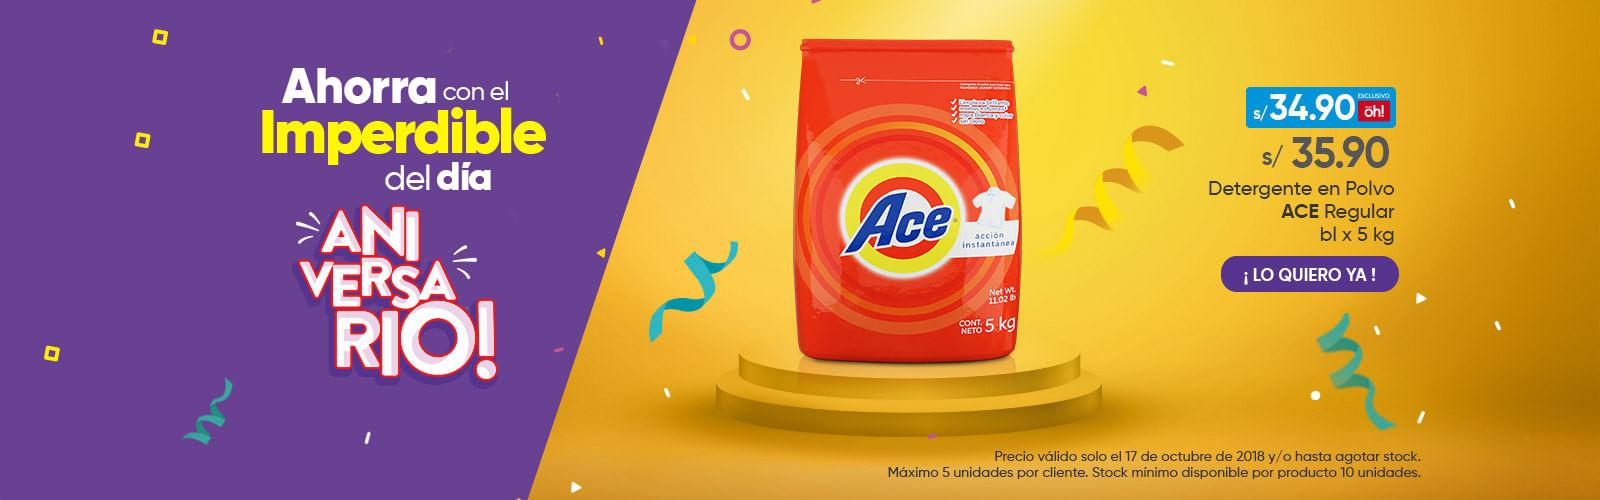 Detergente en Polvo ACE